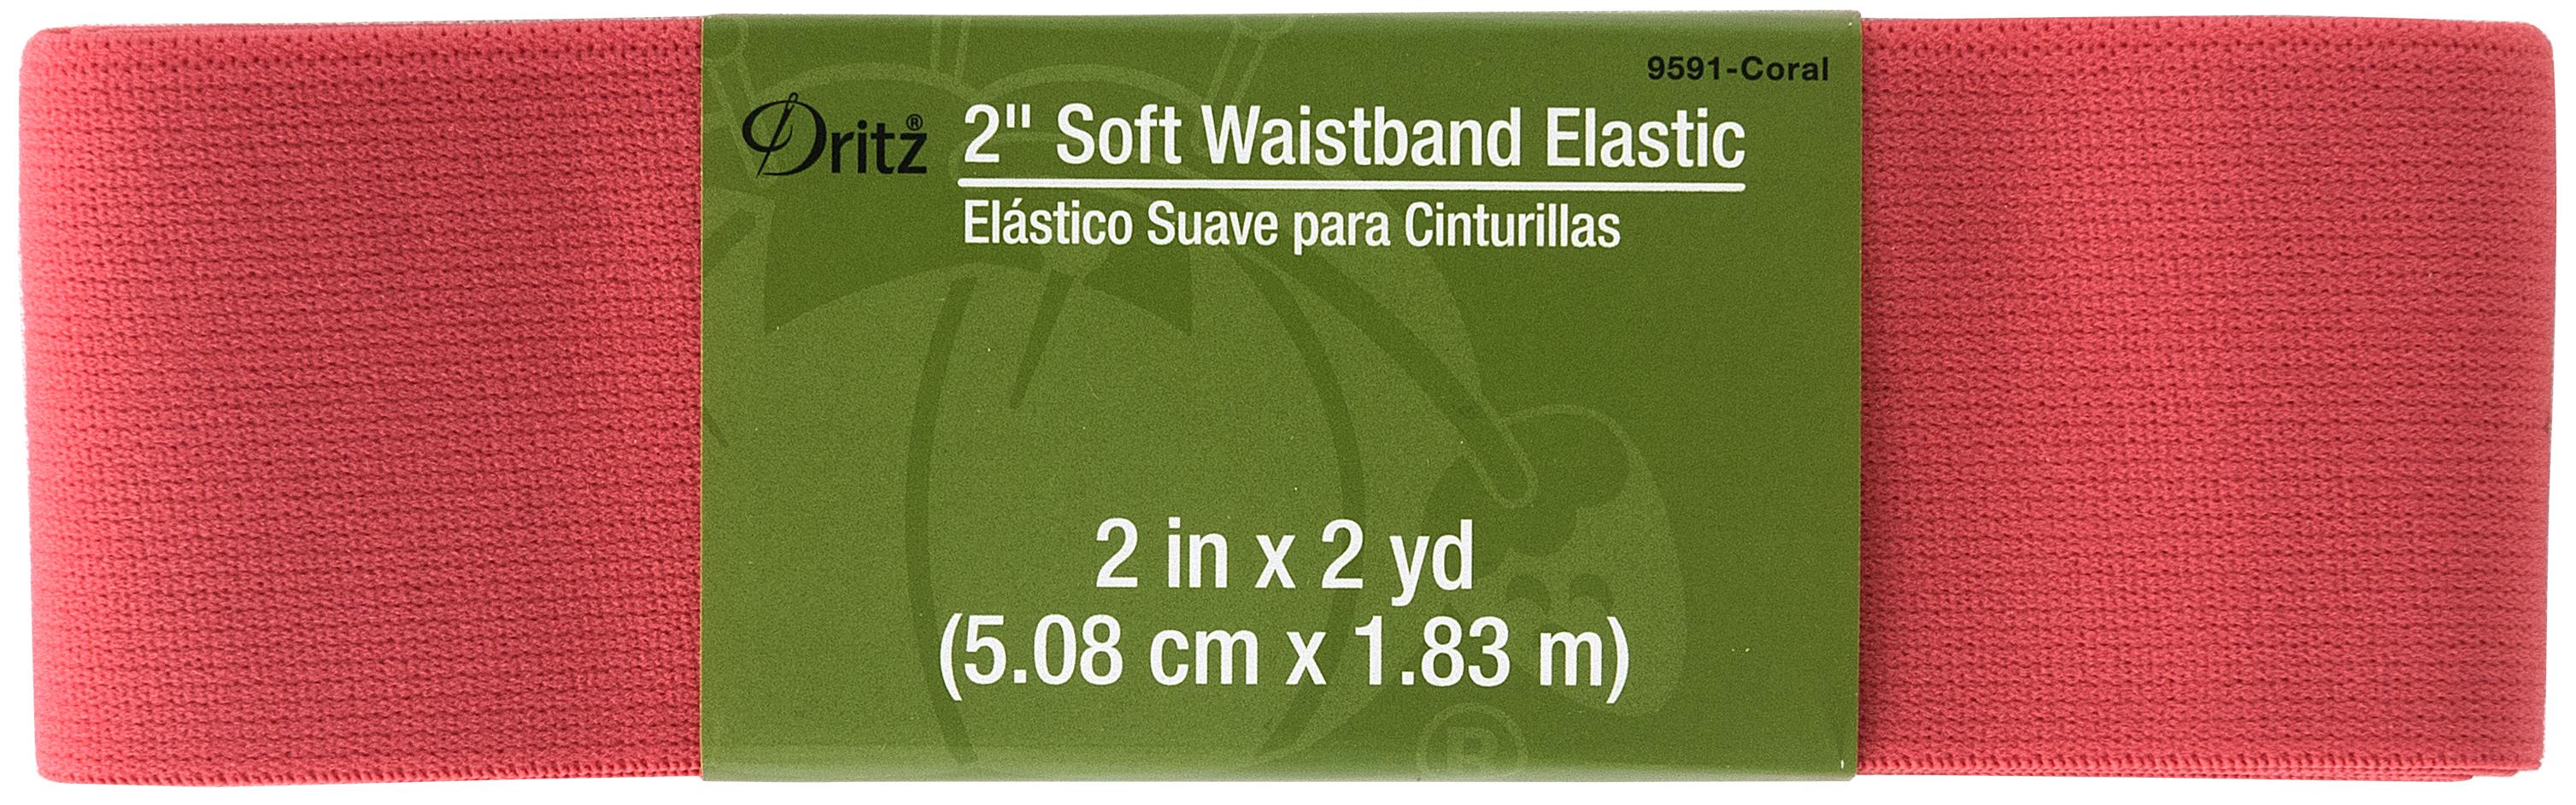 Soft Waistband Elastic - 2 x 2yds - Coral